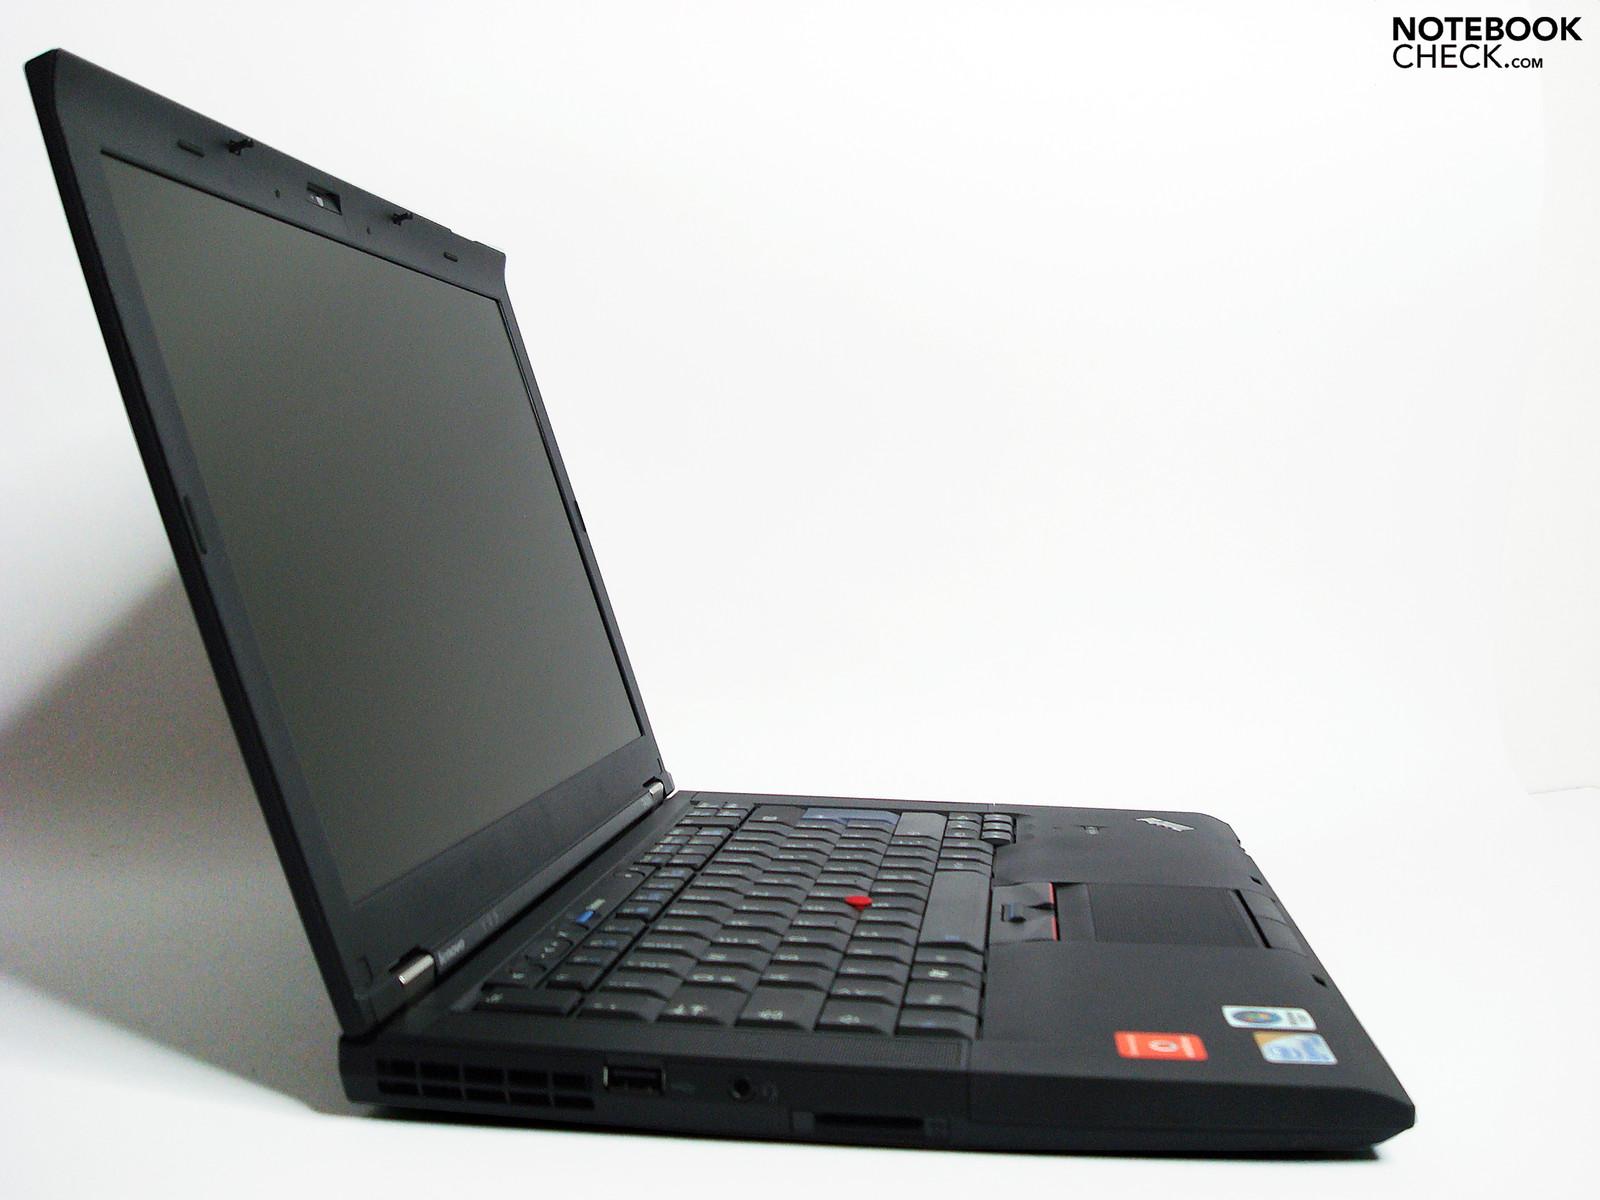 Análisis del Portátil Lenovo ThinkPad T400s ...